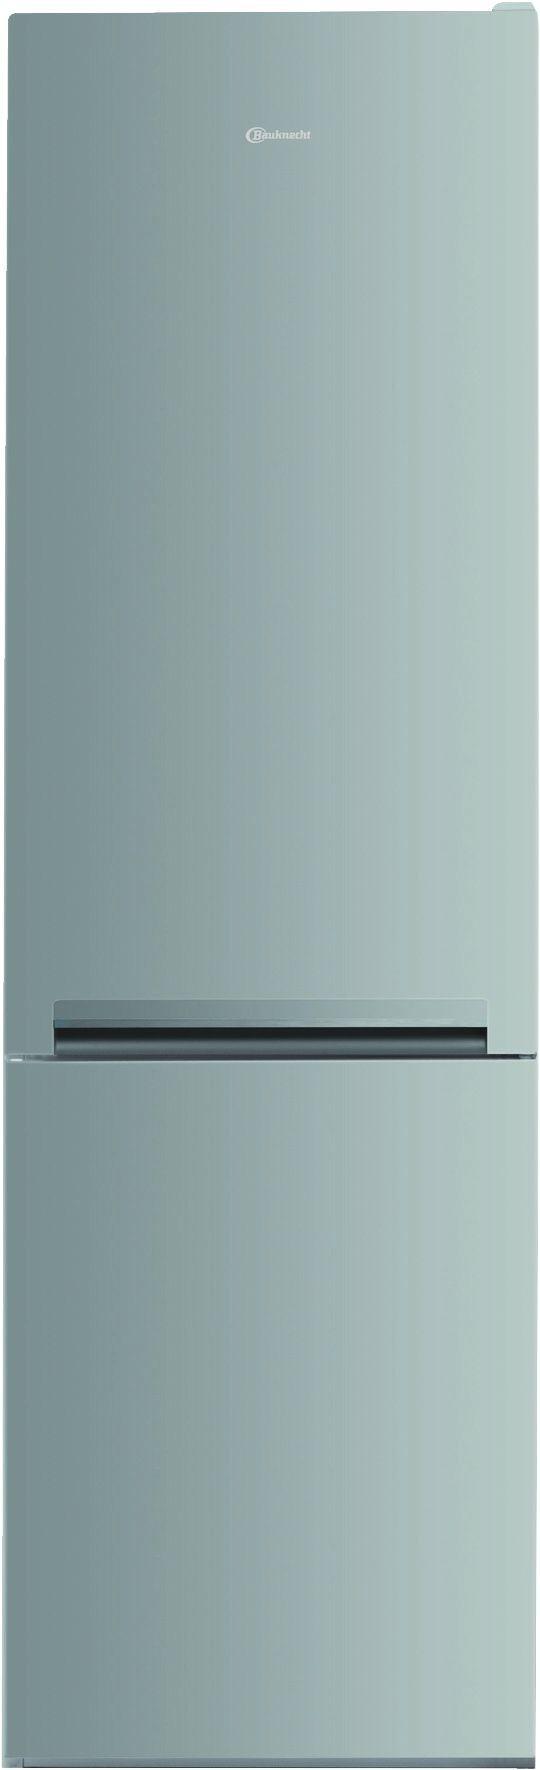 teamsix kglfi 18 a2 in edelstahl bauknecht combinati frigo congelatore. Black Bedroom Furniture Sets. Home Design Ideas